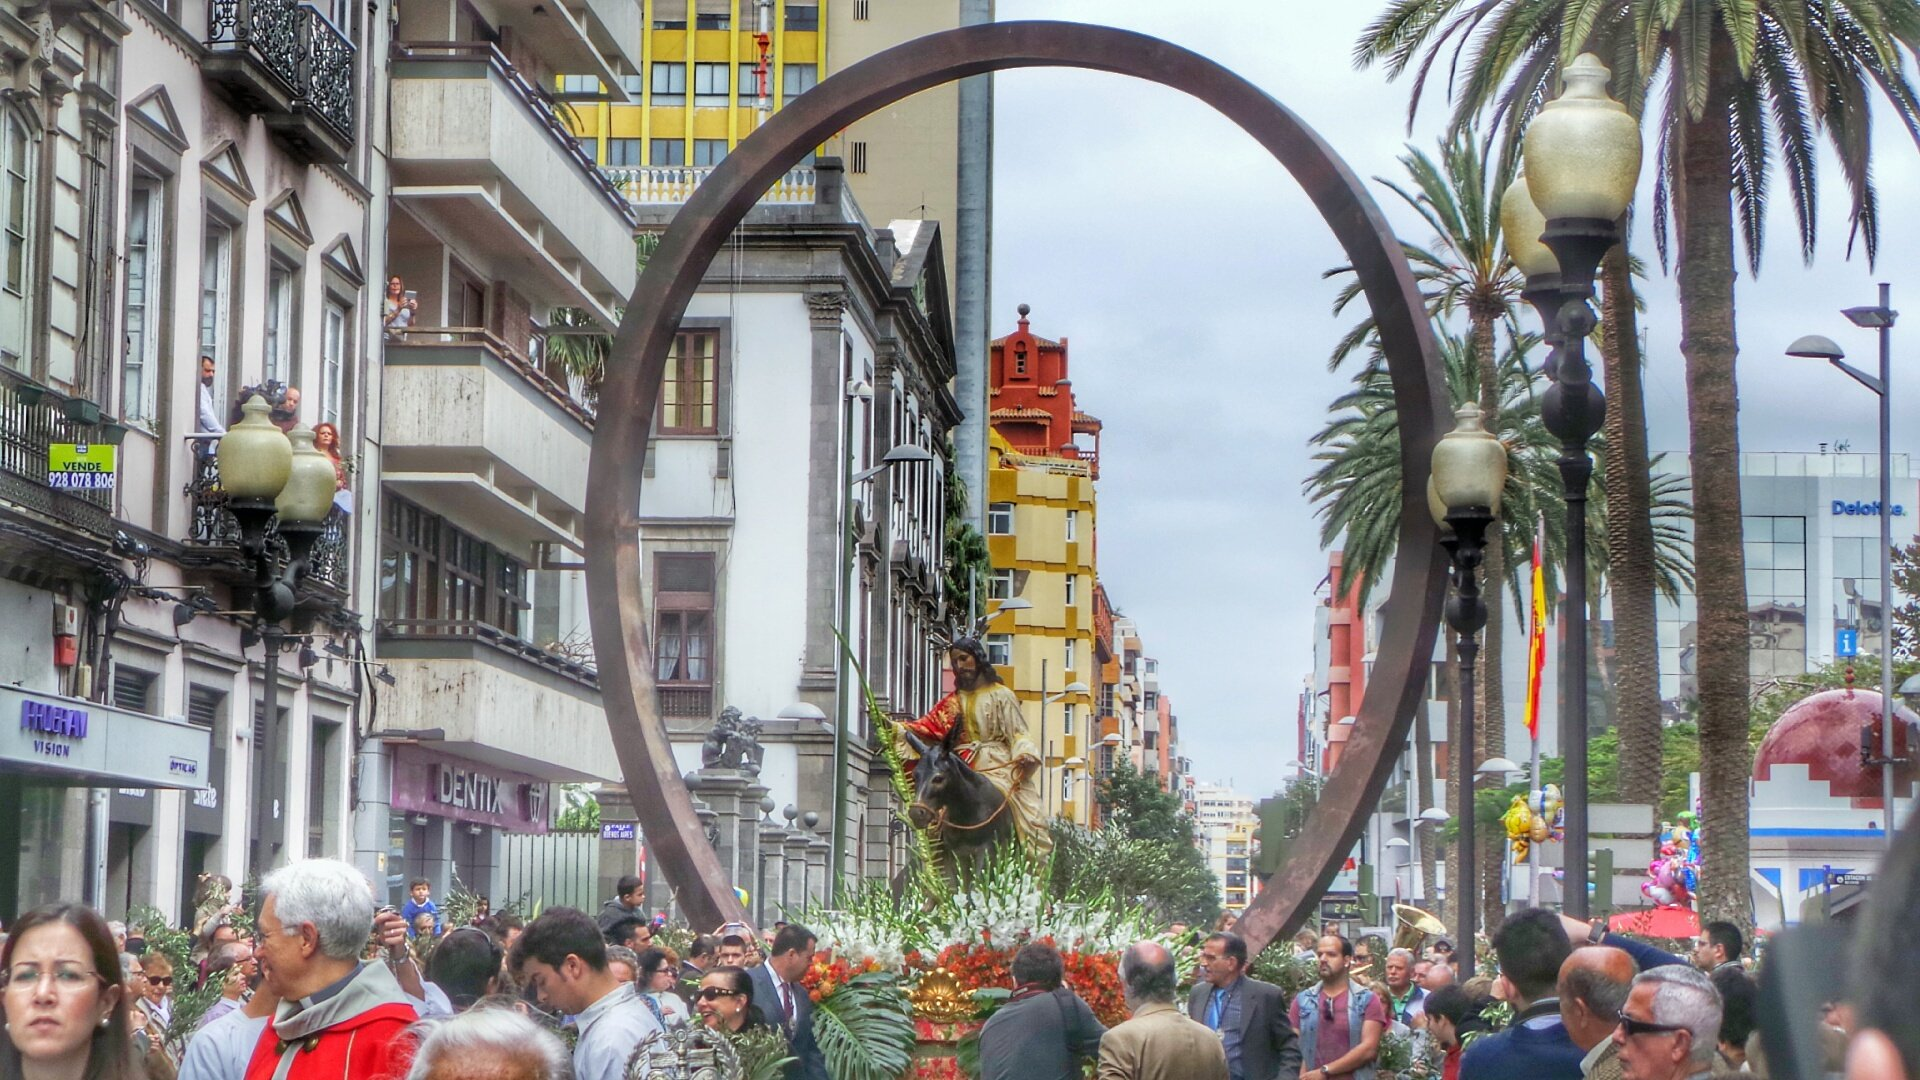 Semana Santa & Easter in Gran Canaria 2020 - Best Time